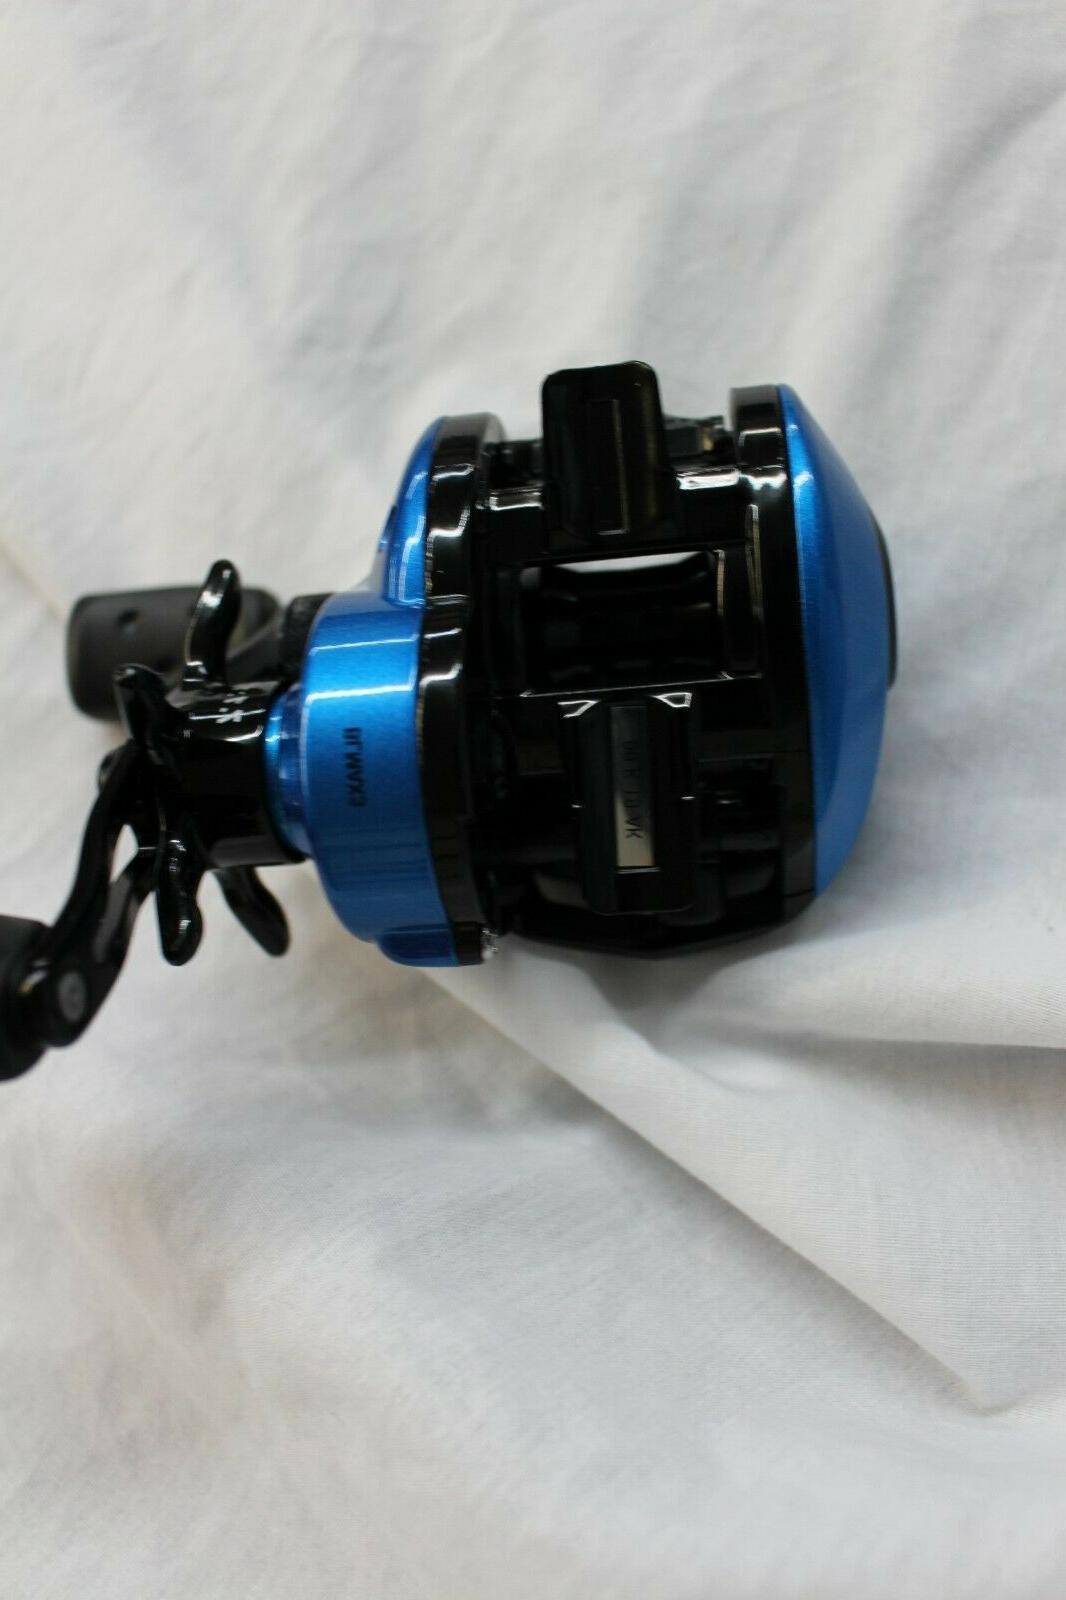 ABU GARCIA BLUE LOW PROFILE RIGHT-HANDED BAITCASTING REEL- BLMAX3